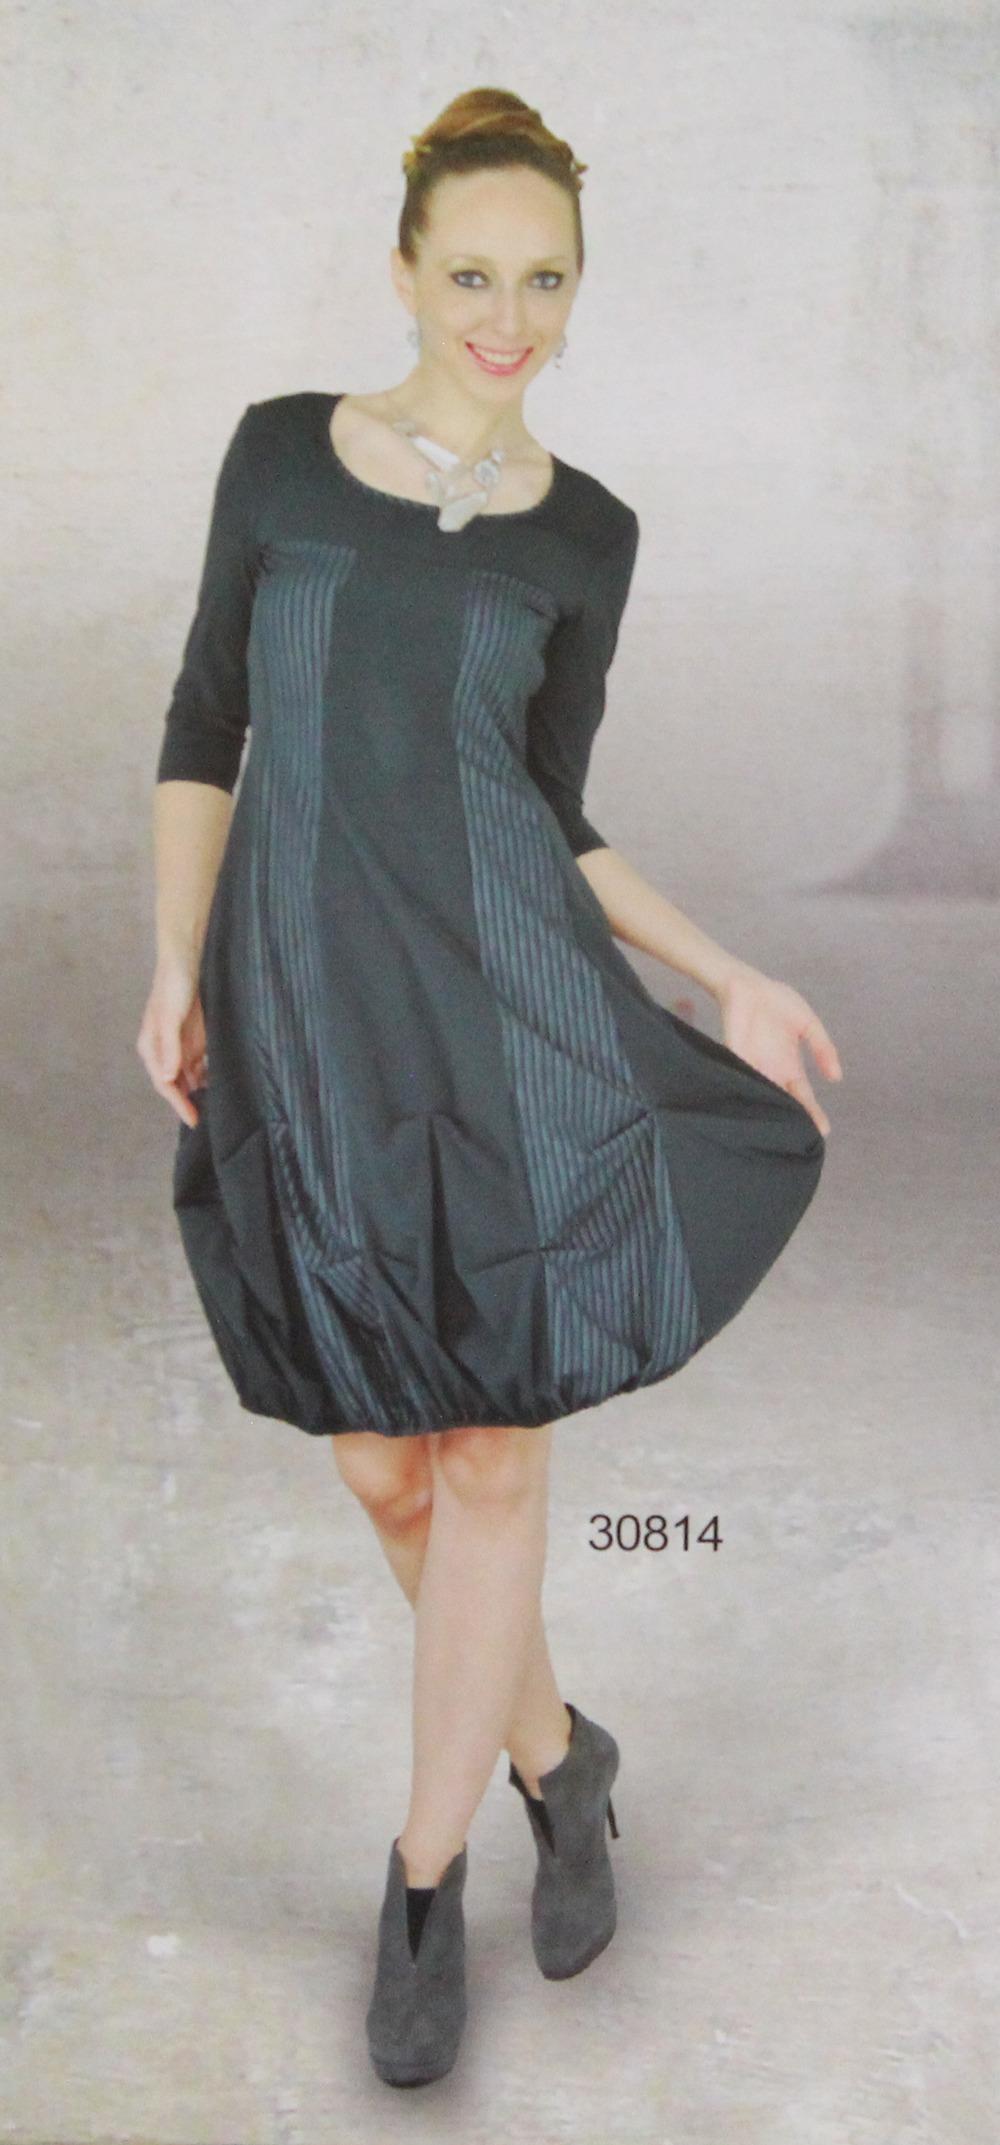 Dzhavael Couture: Slinky Emerald Dress (Almost Gone!) DZ_30814